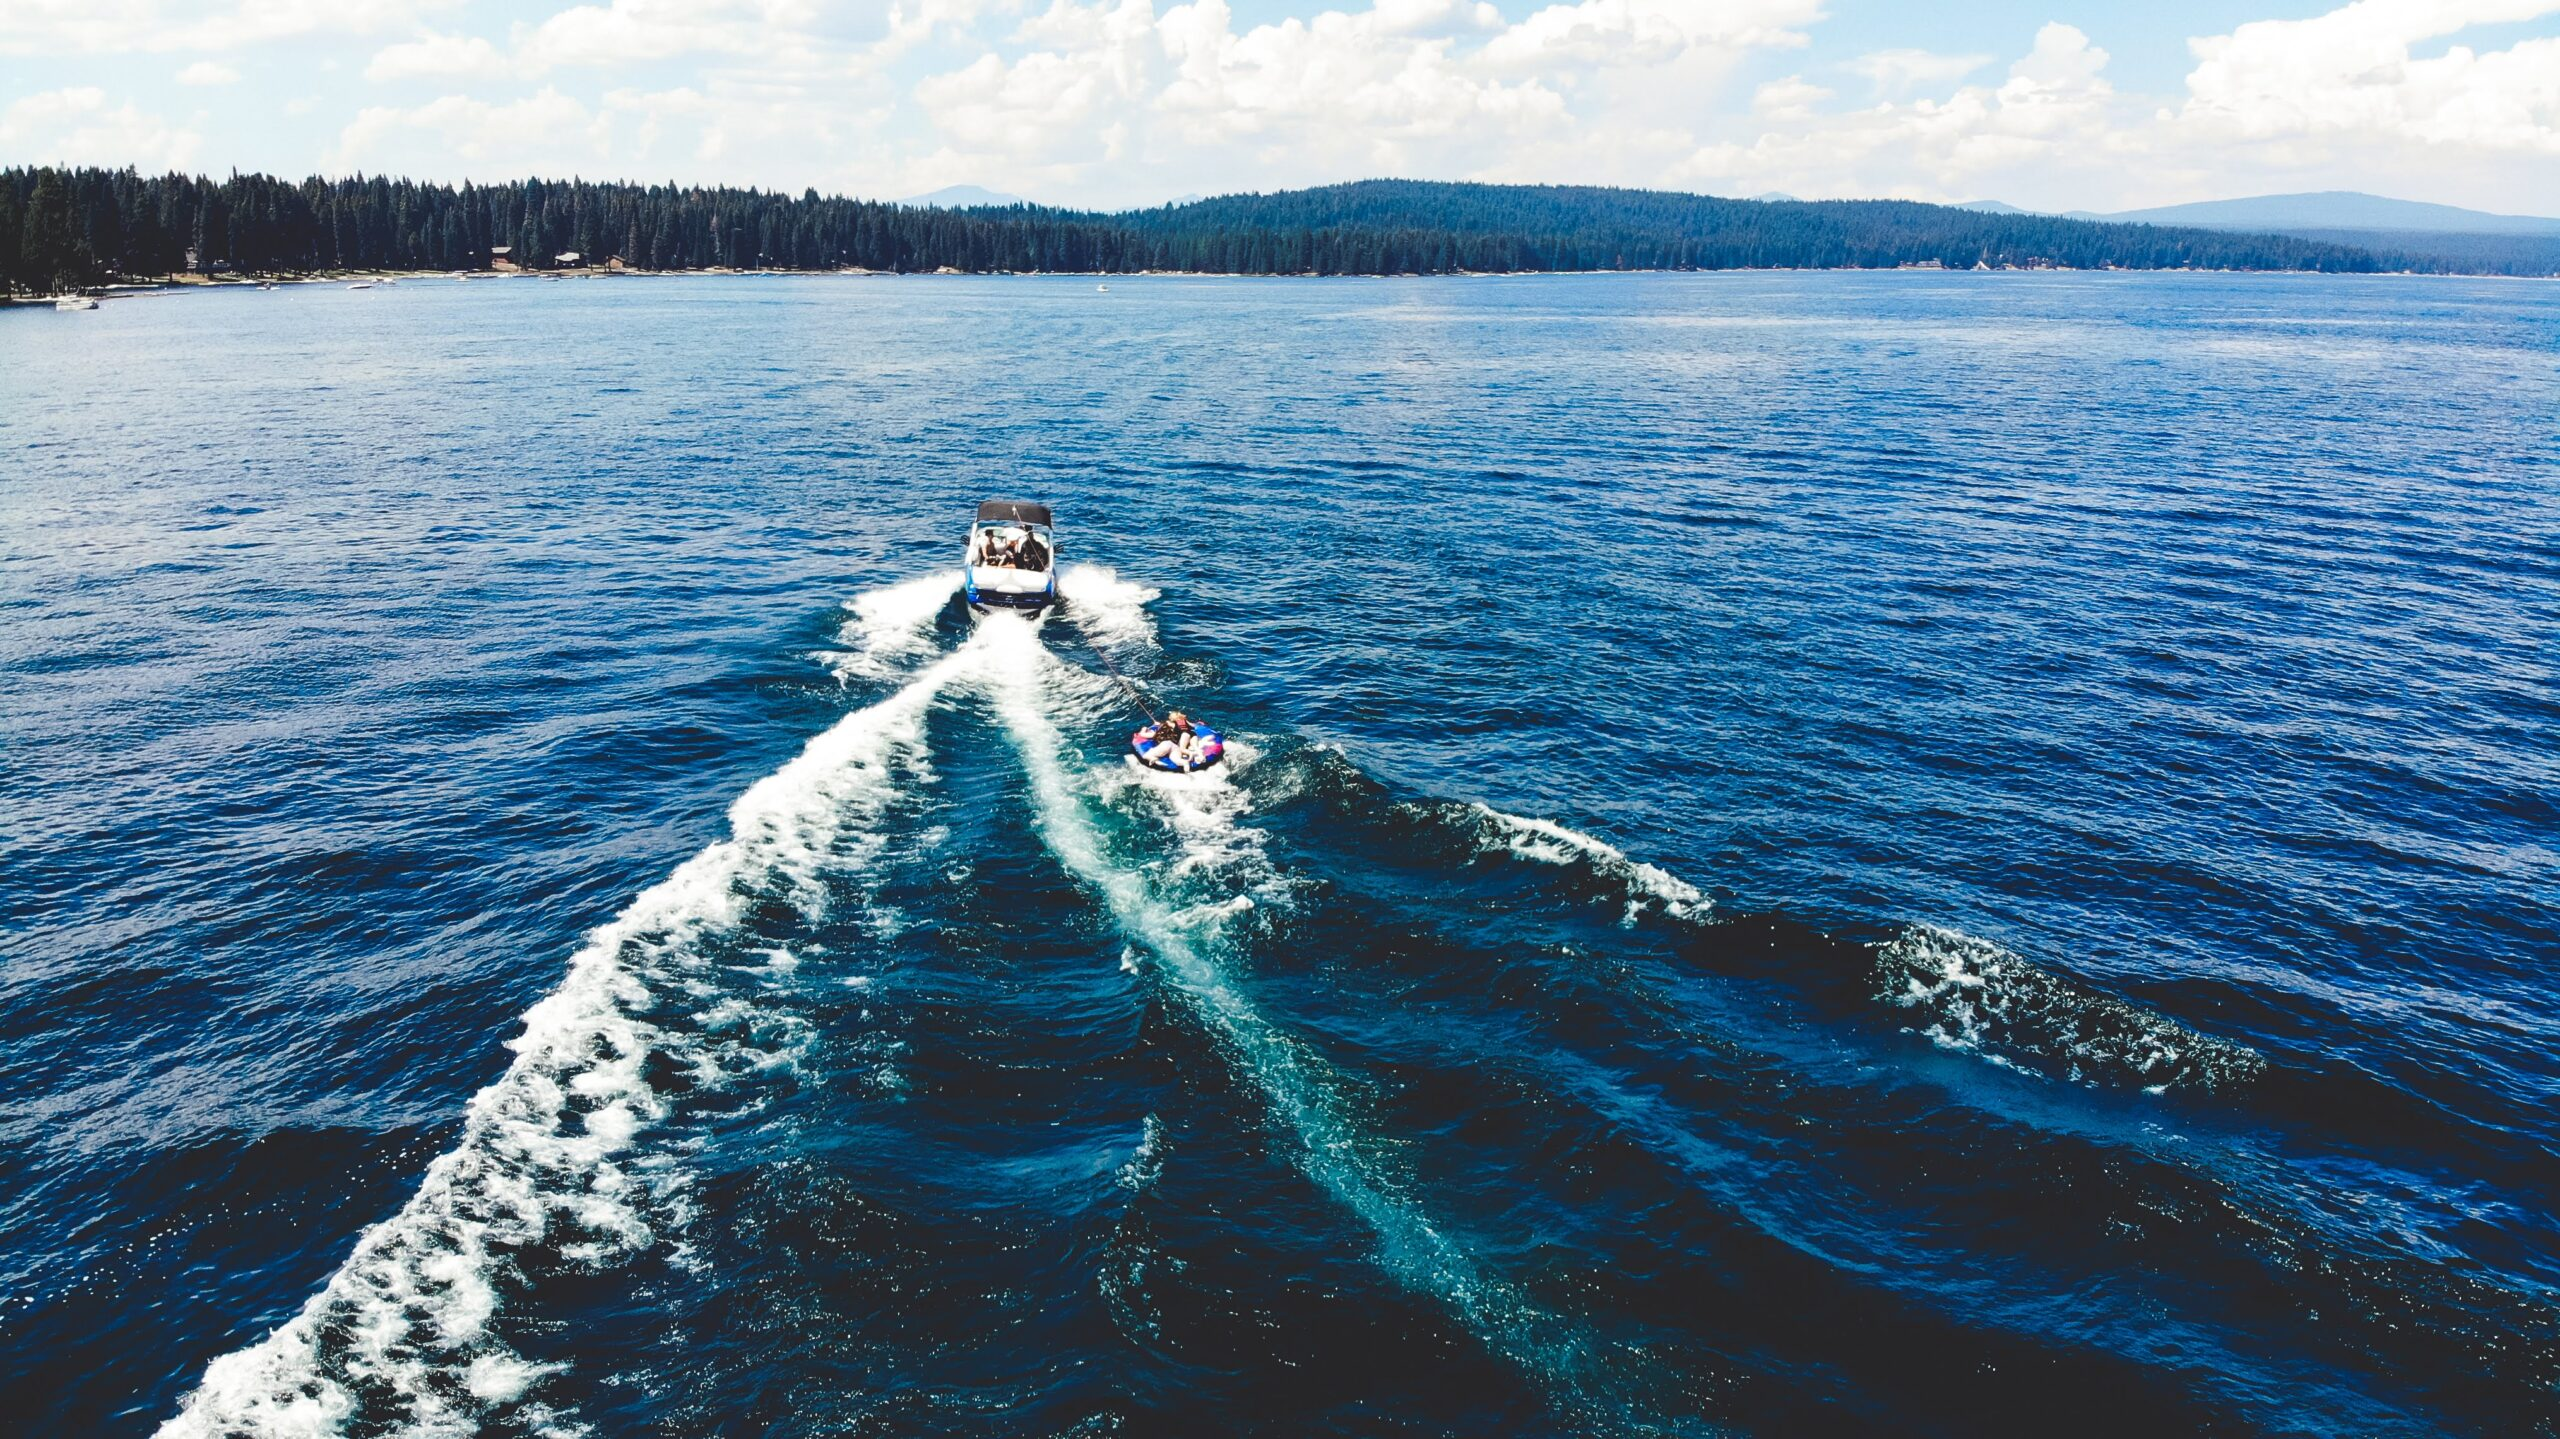 The Lake: water sports day trip to Lake Almanor